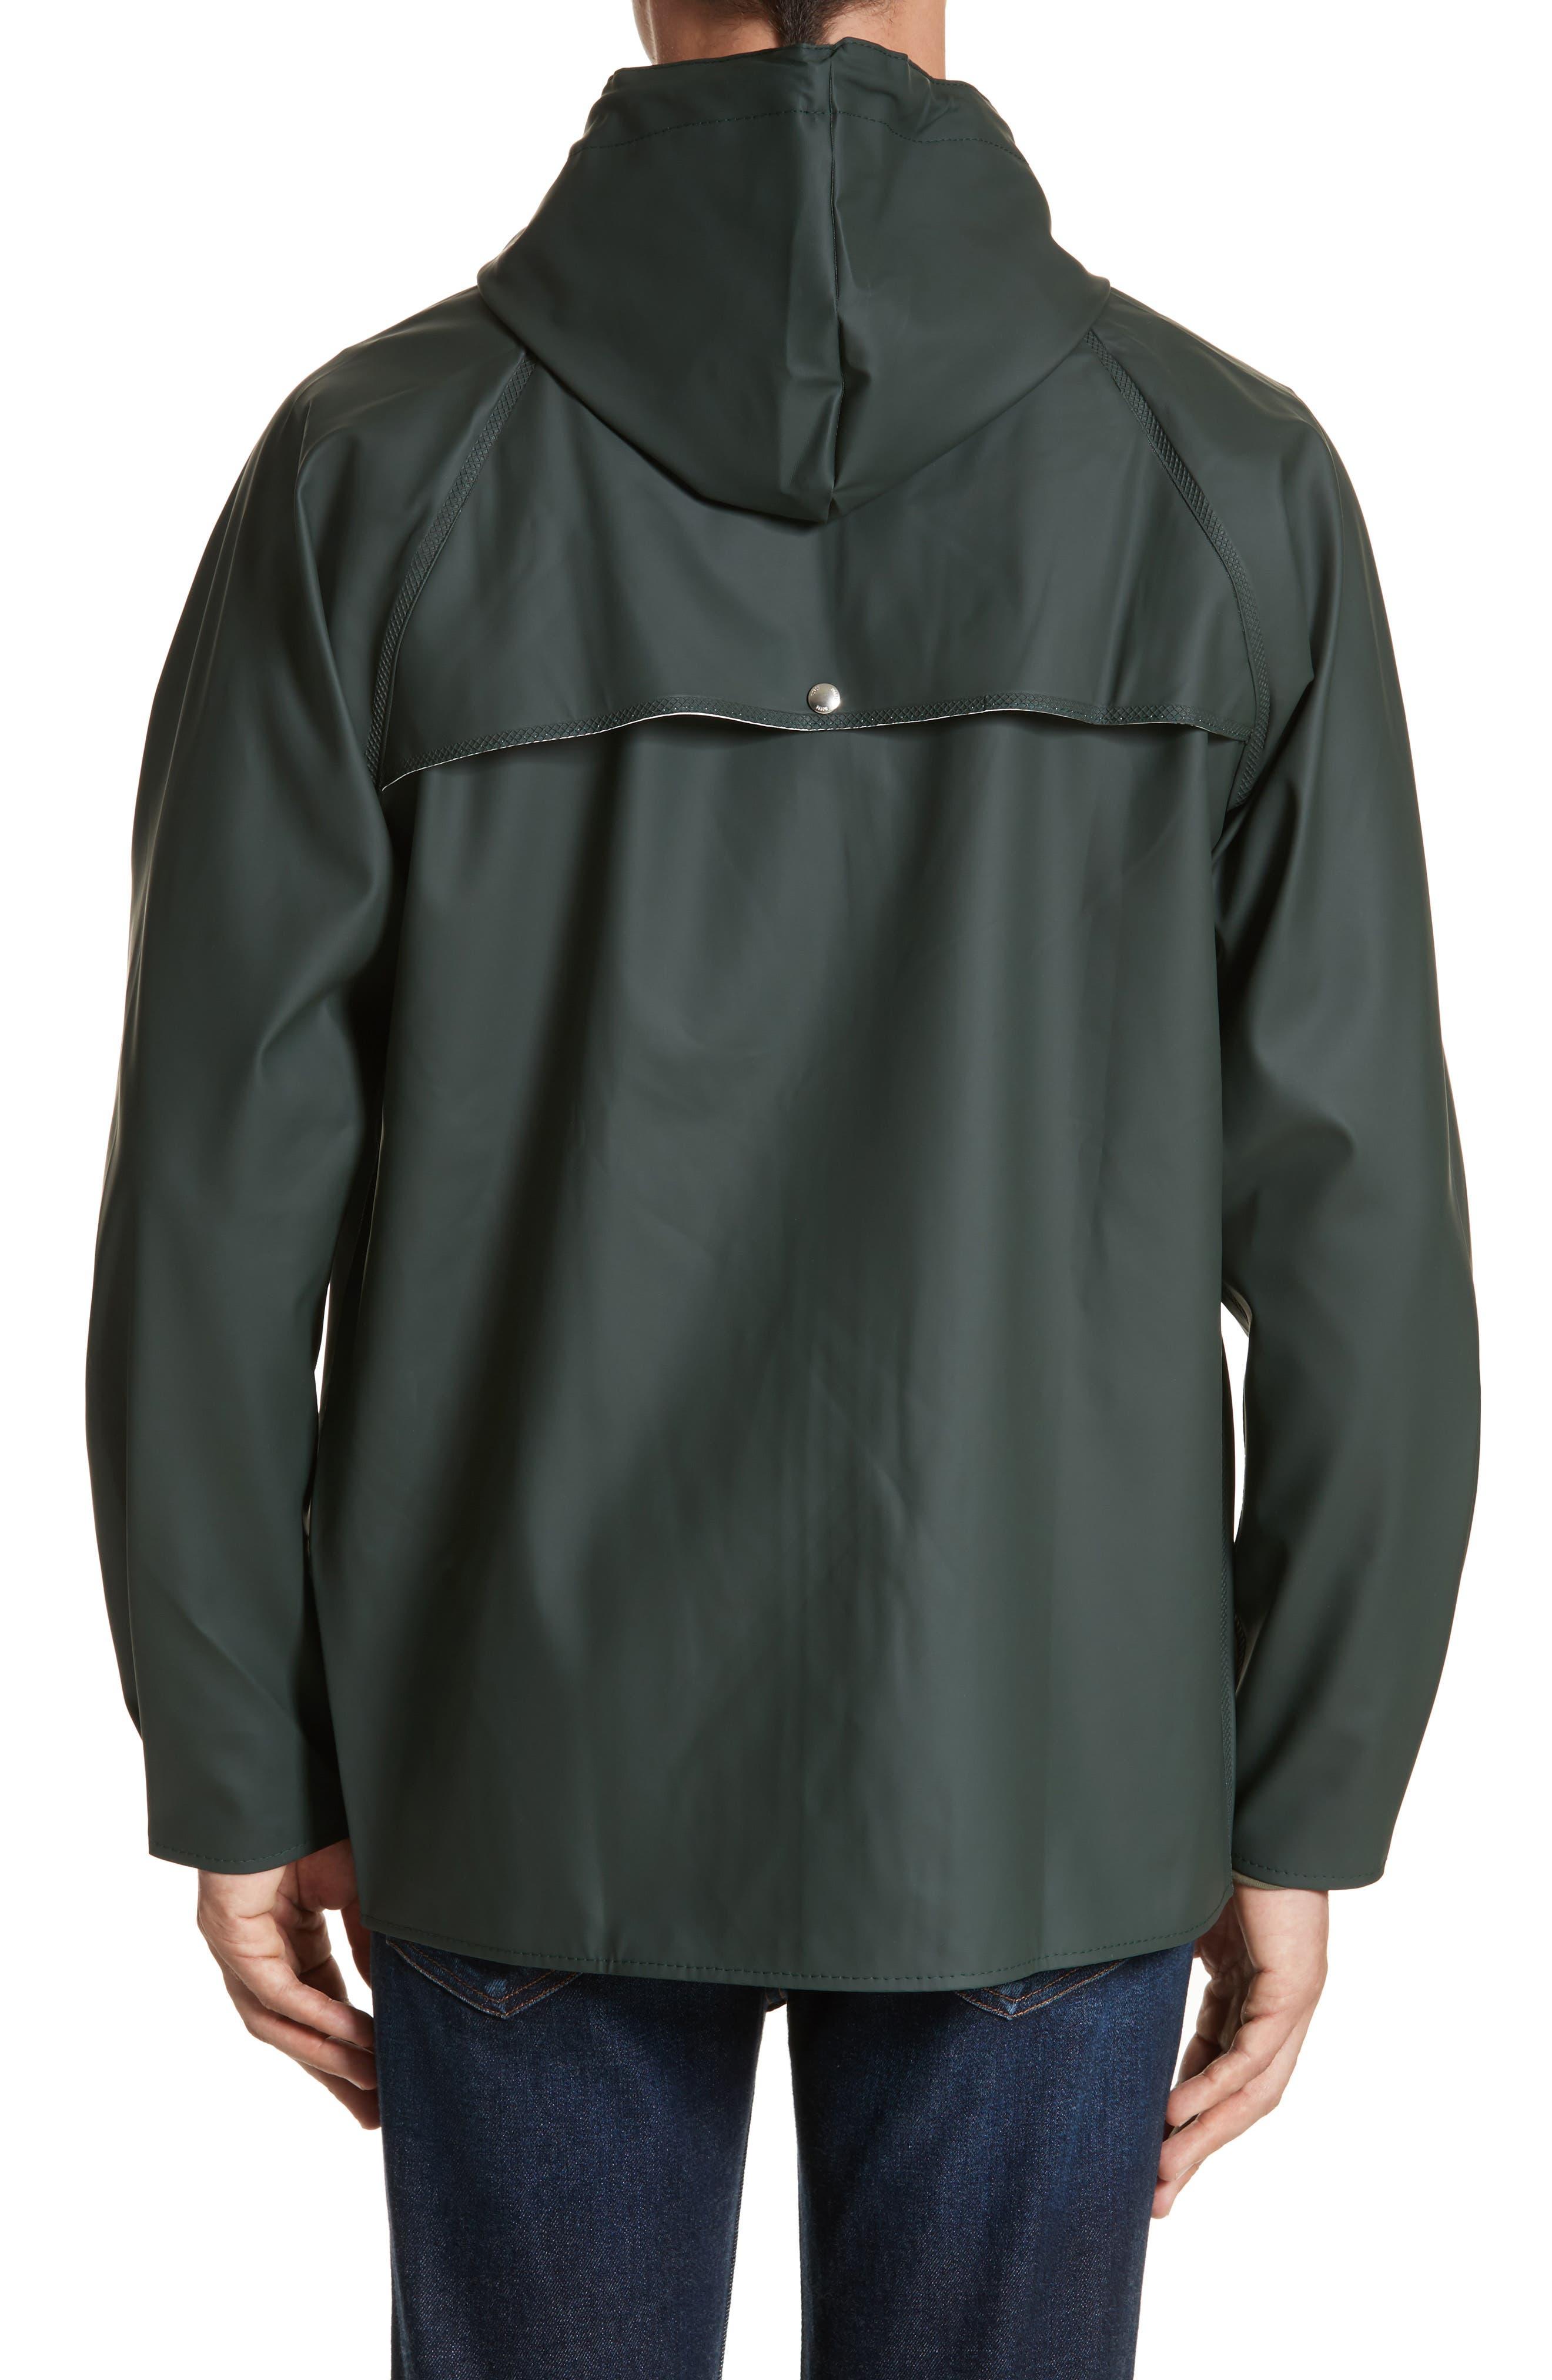 Waterproof Rain Jacket,                             Alternate thumbnail 2, color,                             Moss